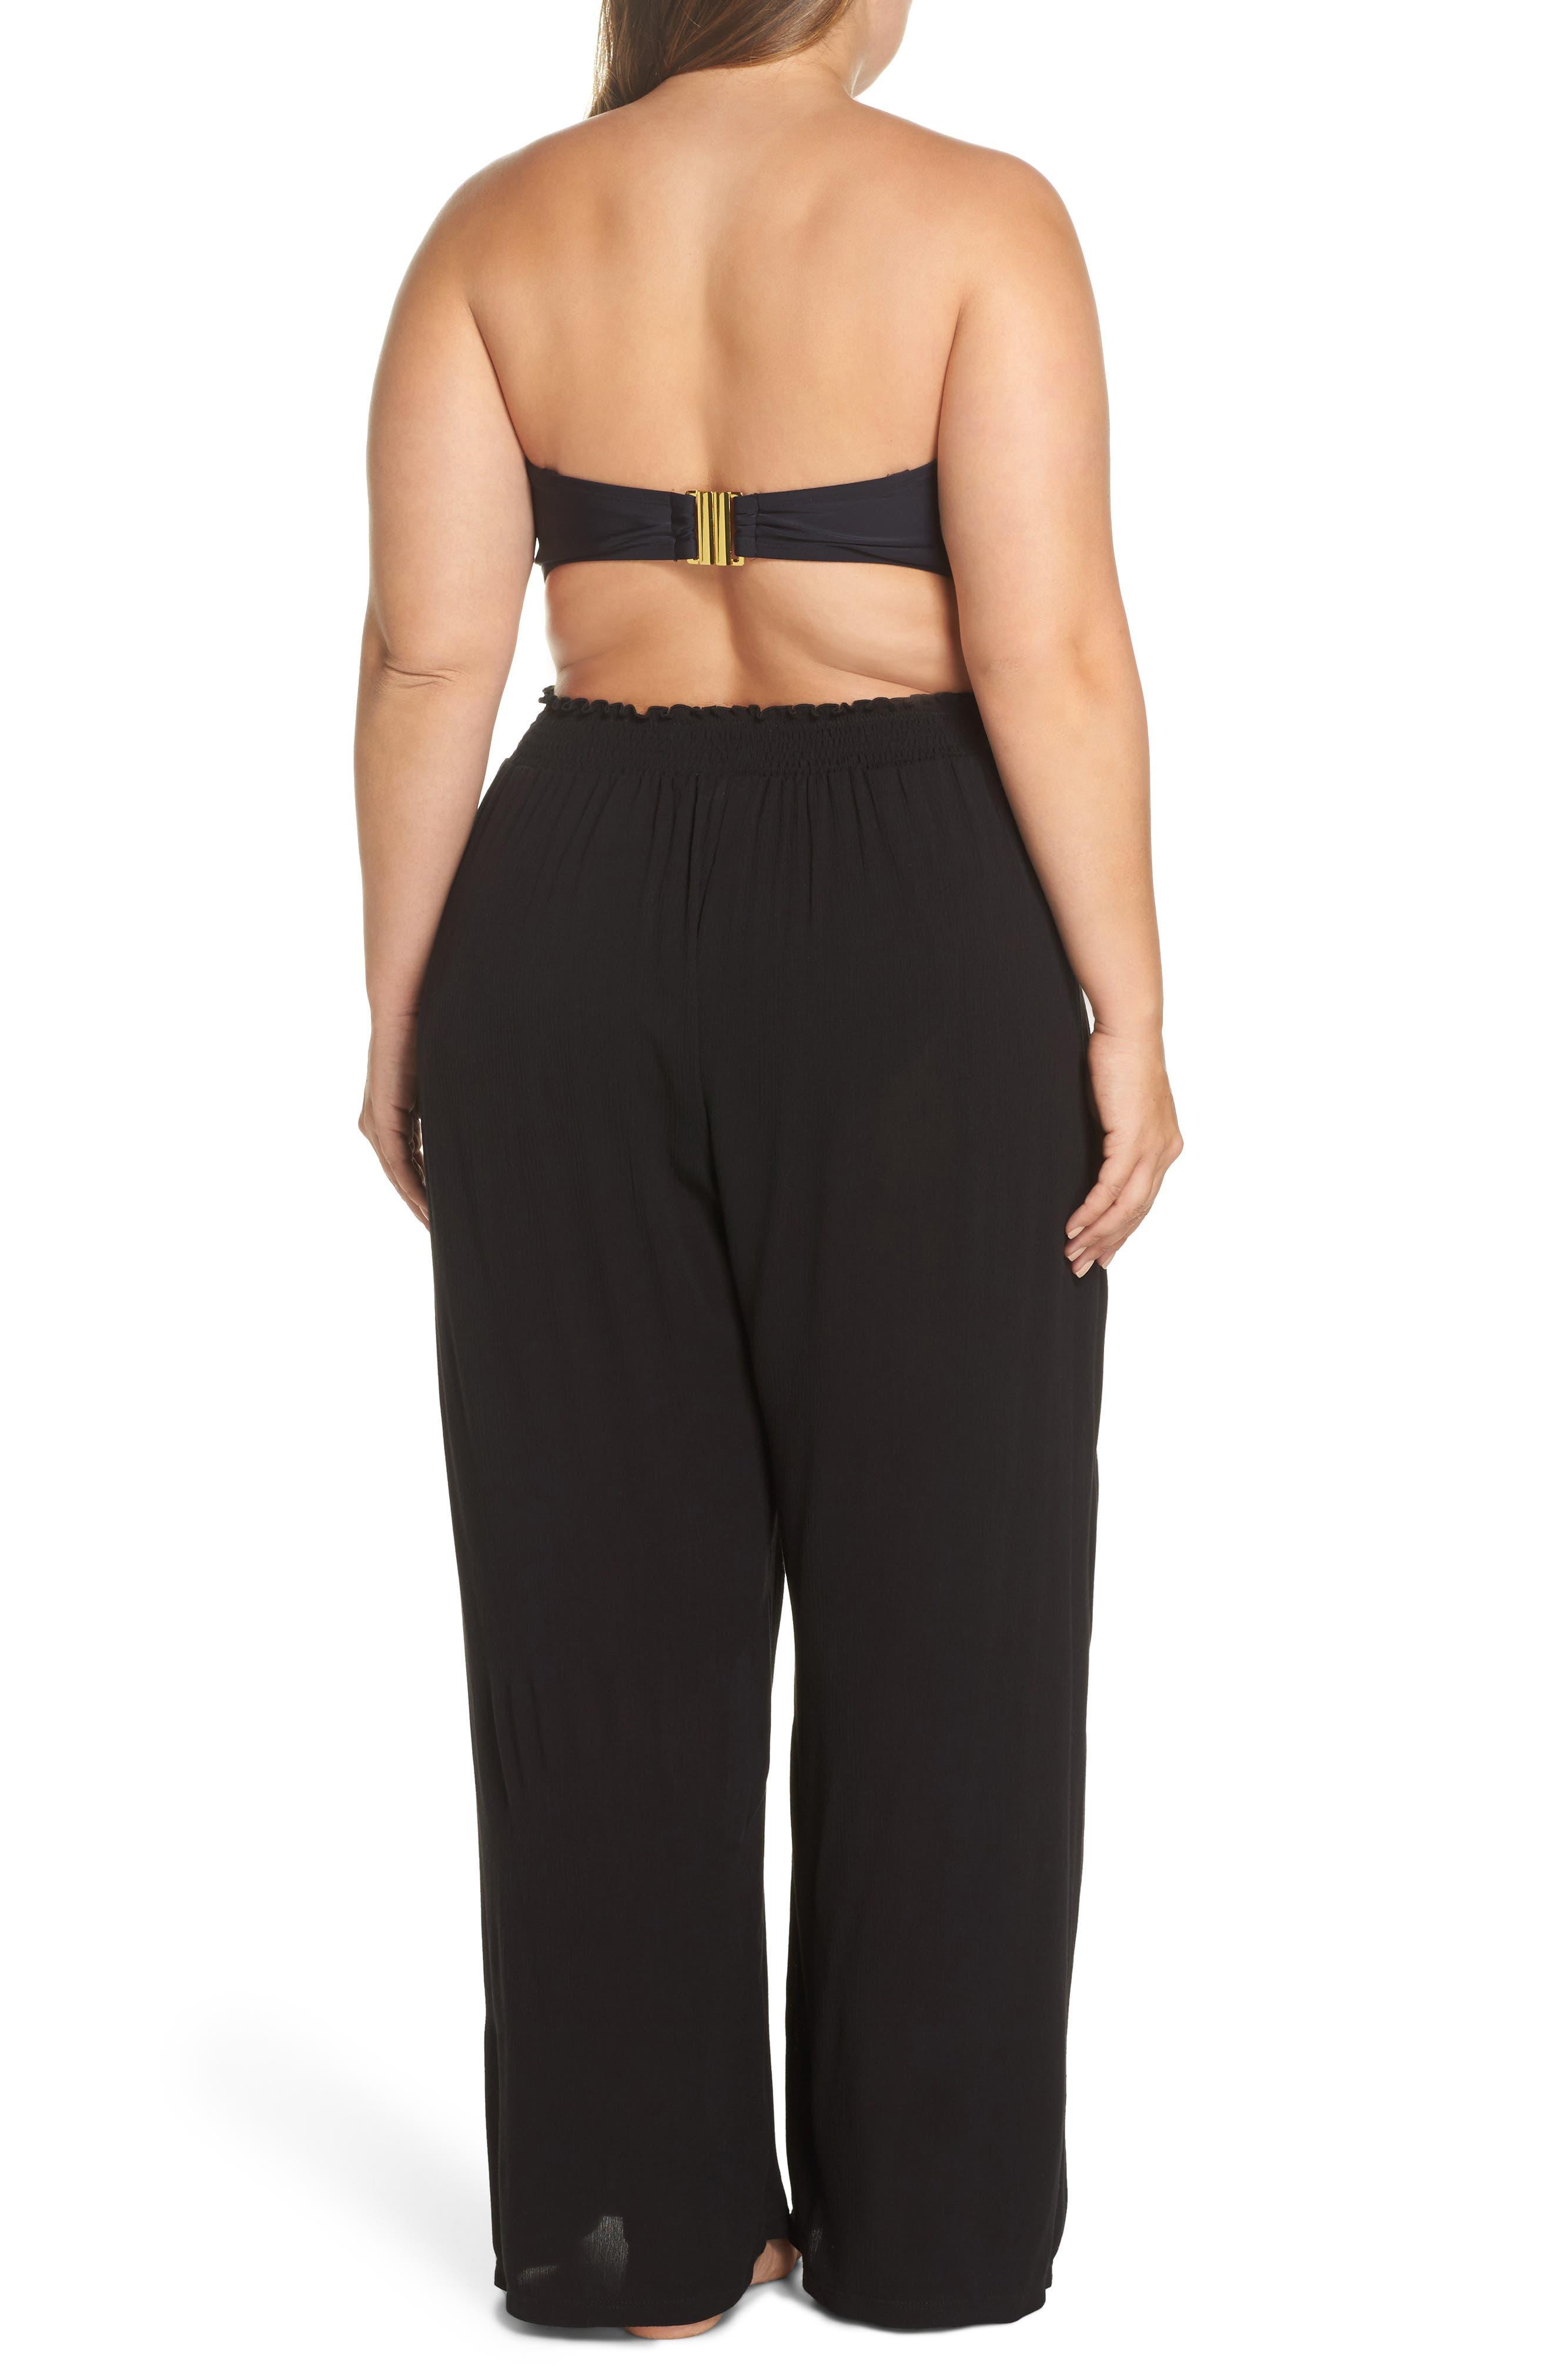 BECCA ETC., Modern Muse Cover-Up Pants, Alternate thumbnail 2, color, BLACK